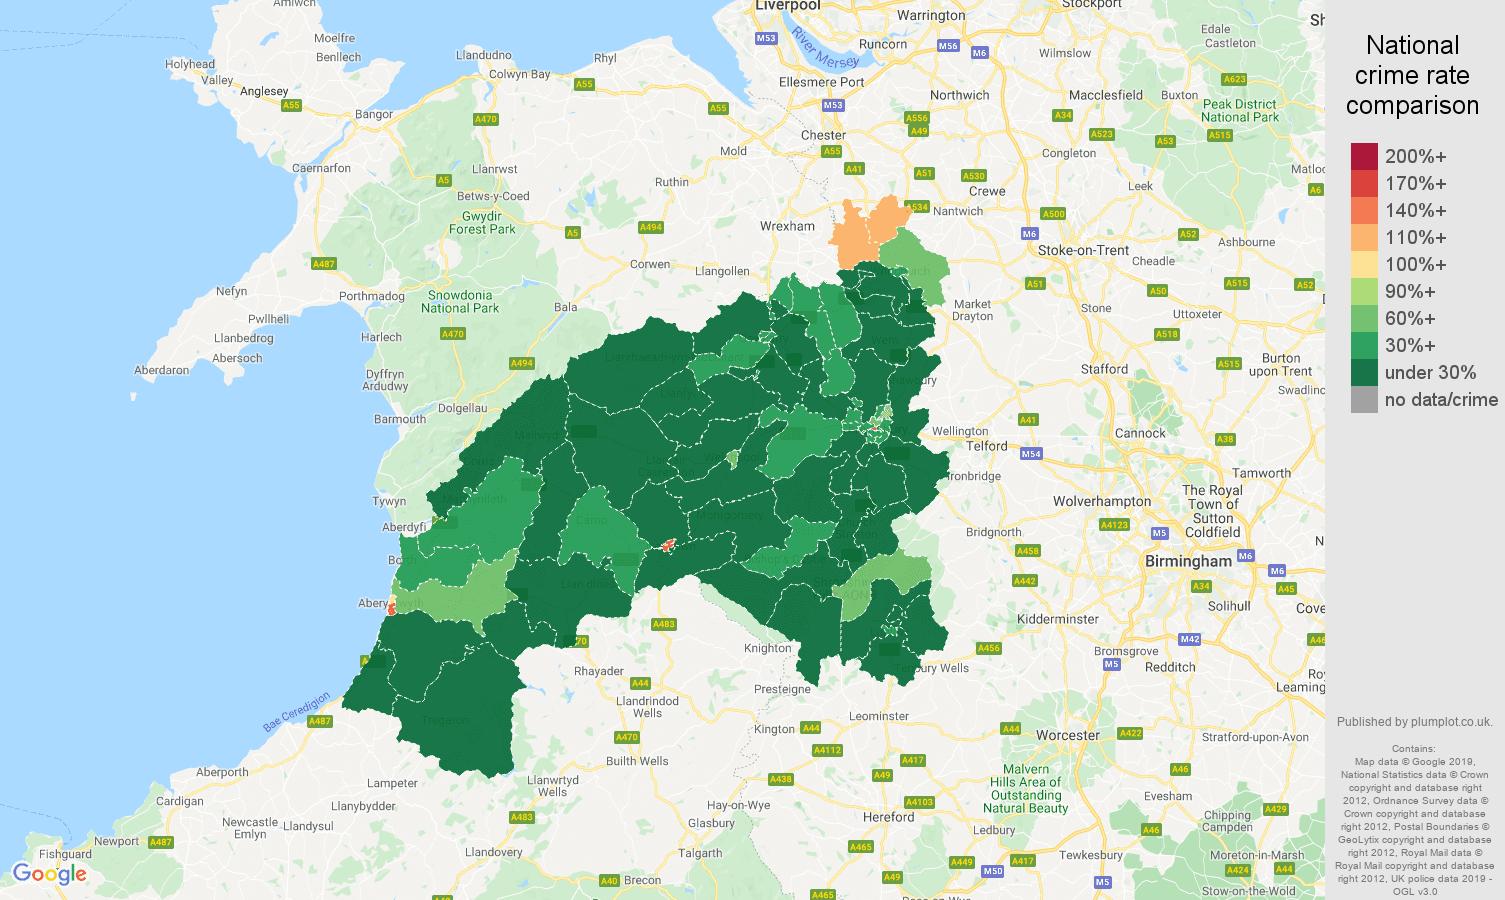 Shrewsbury public order crime rate comparison map